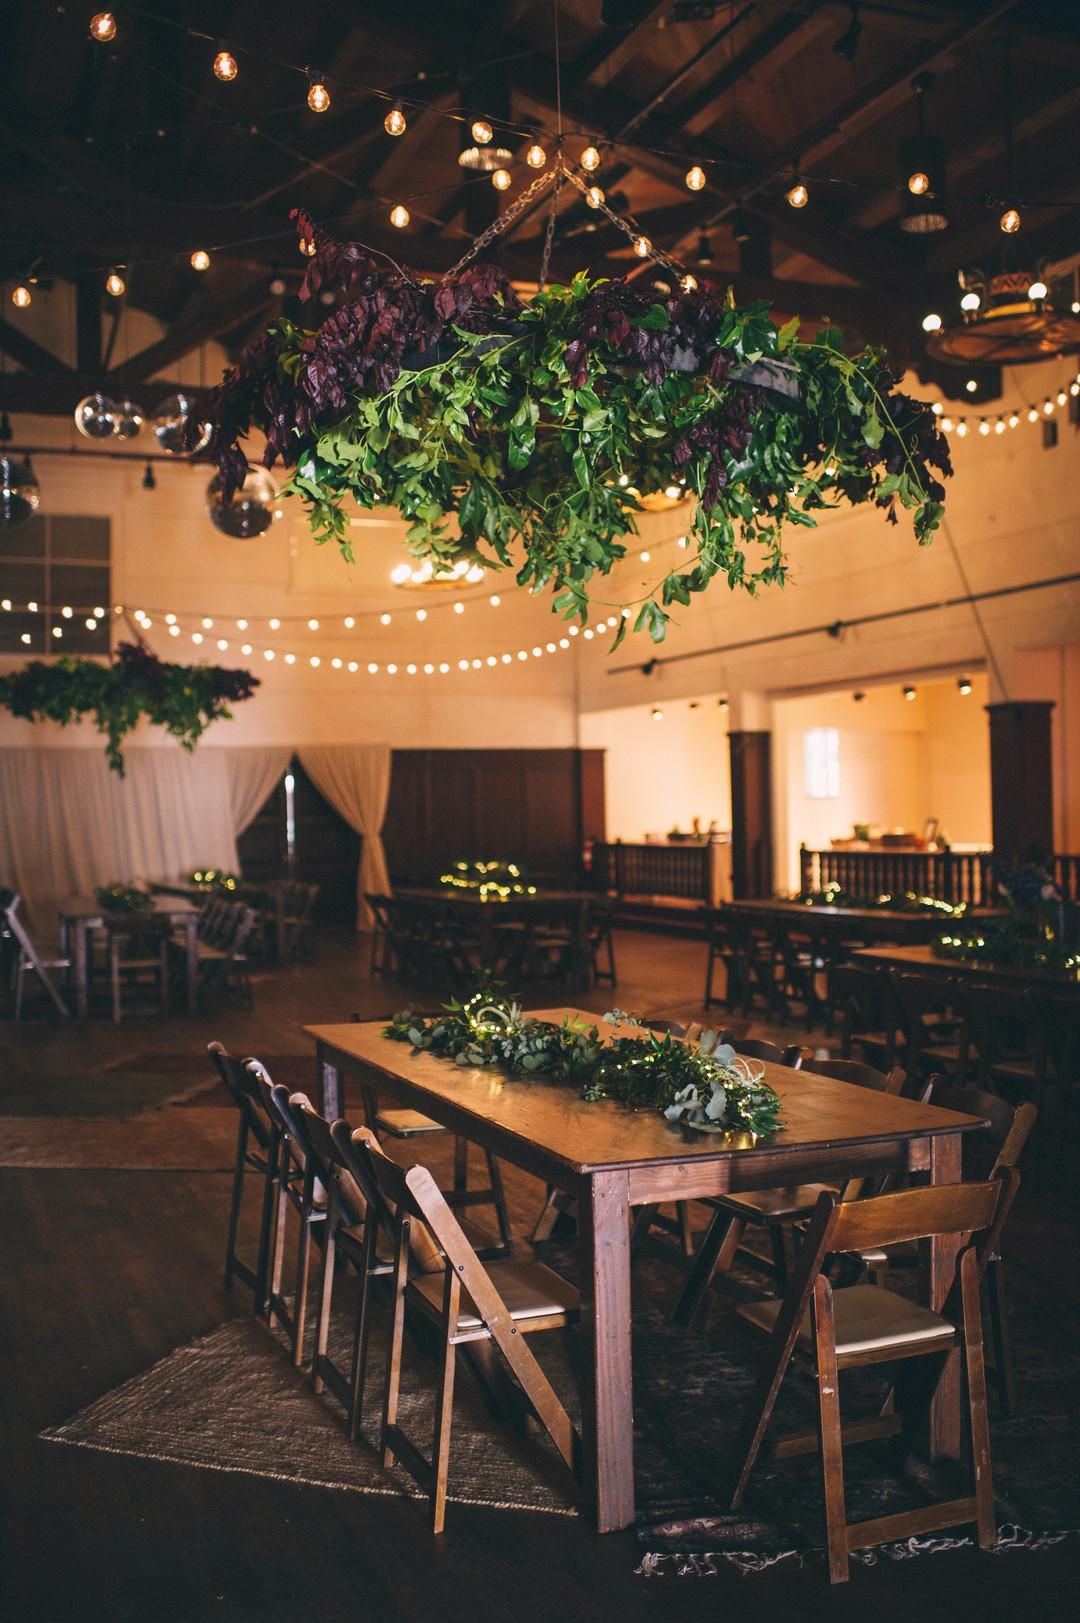 www.santabarbarawedding.com | Sarah Katherine Davis Photography | Santa Barbara Museum of Natural History | Wild Heart Events | Bella Vista Designs | Seasons Catering | Reception Set Up